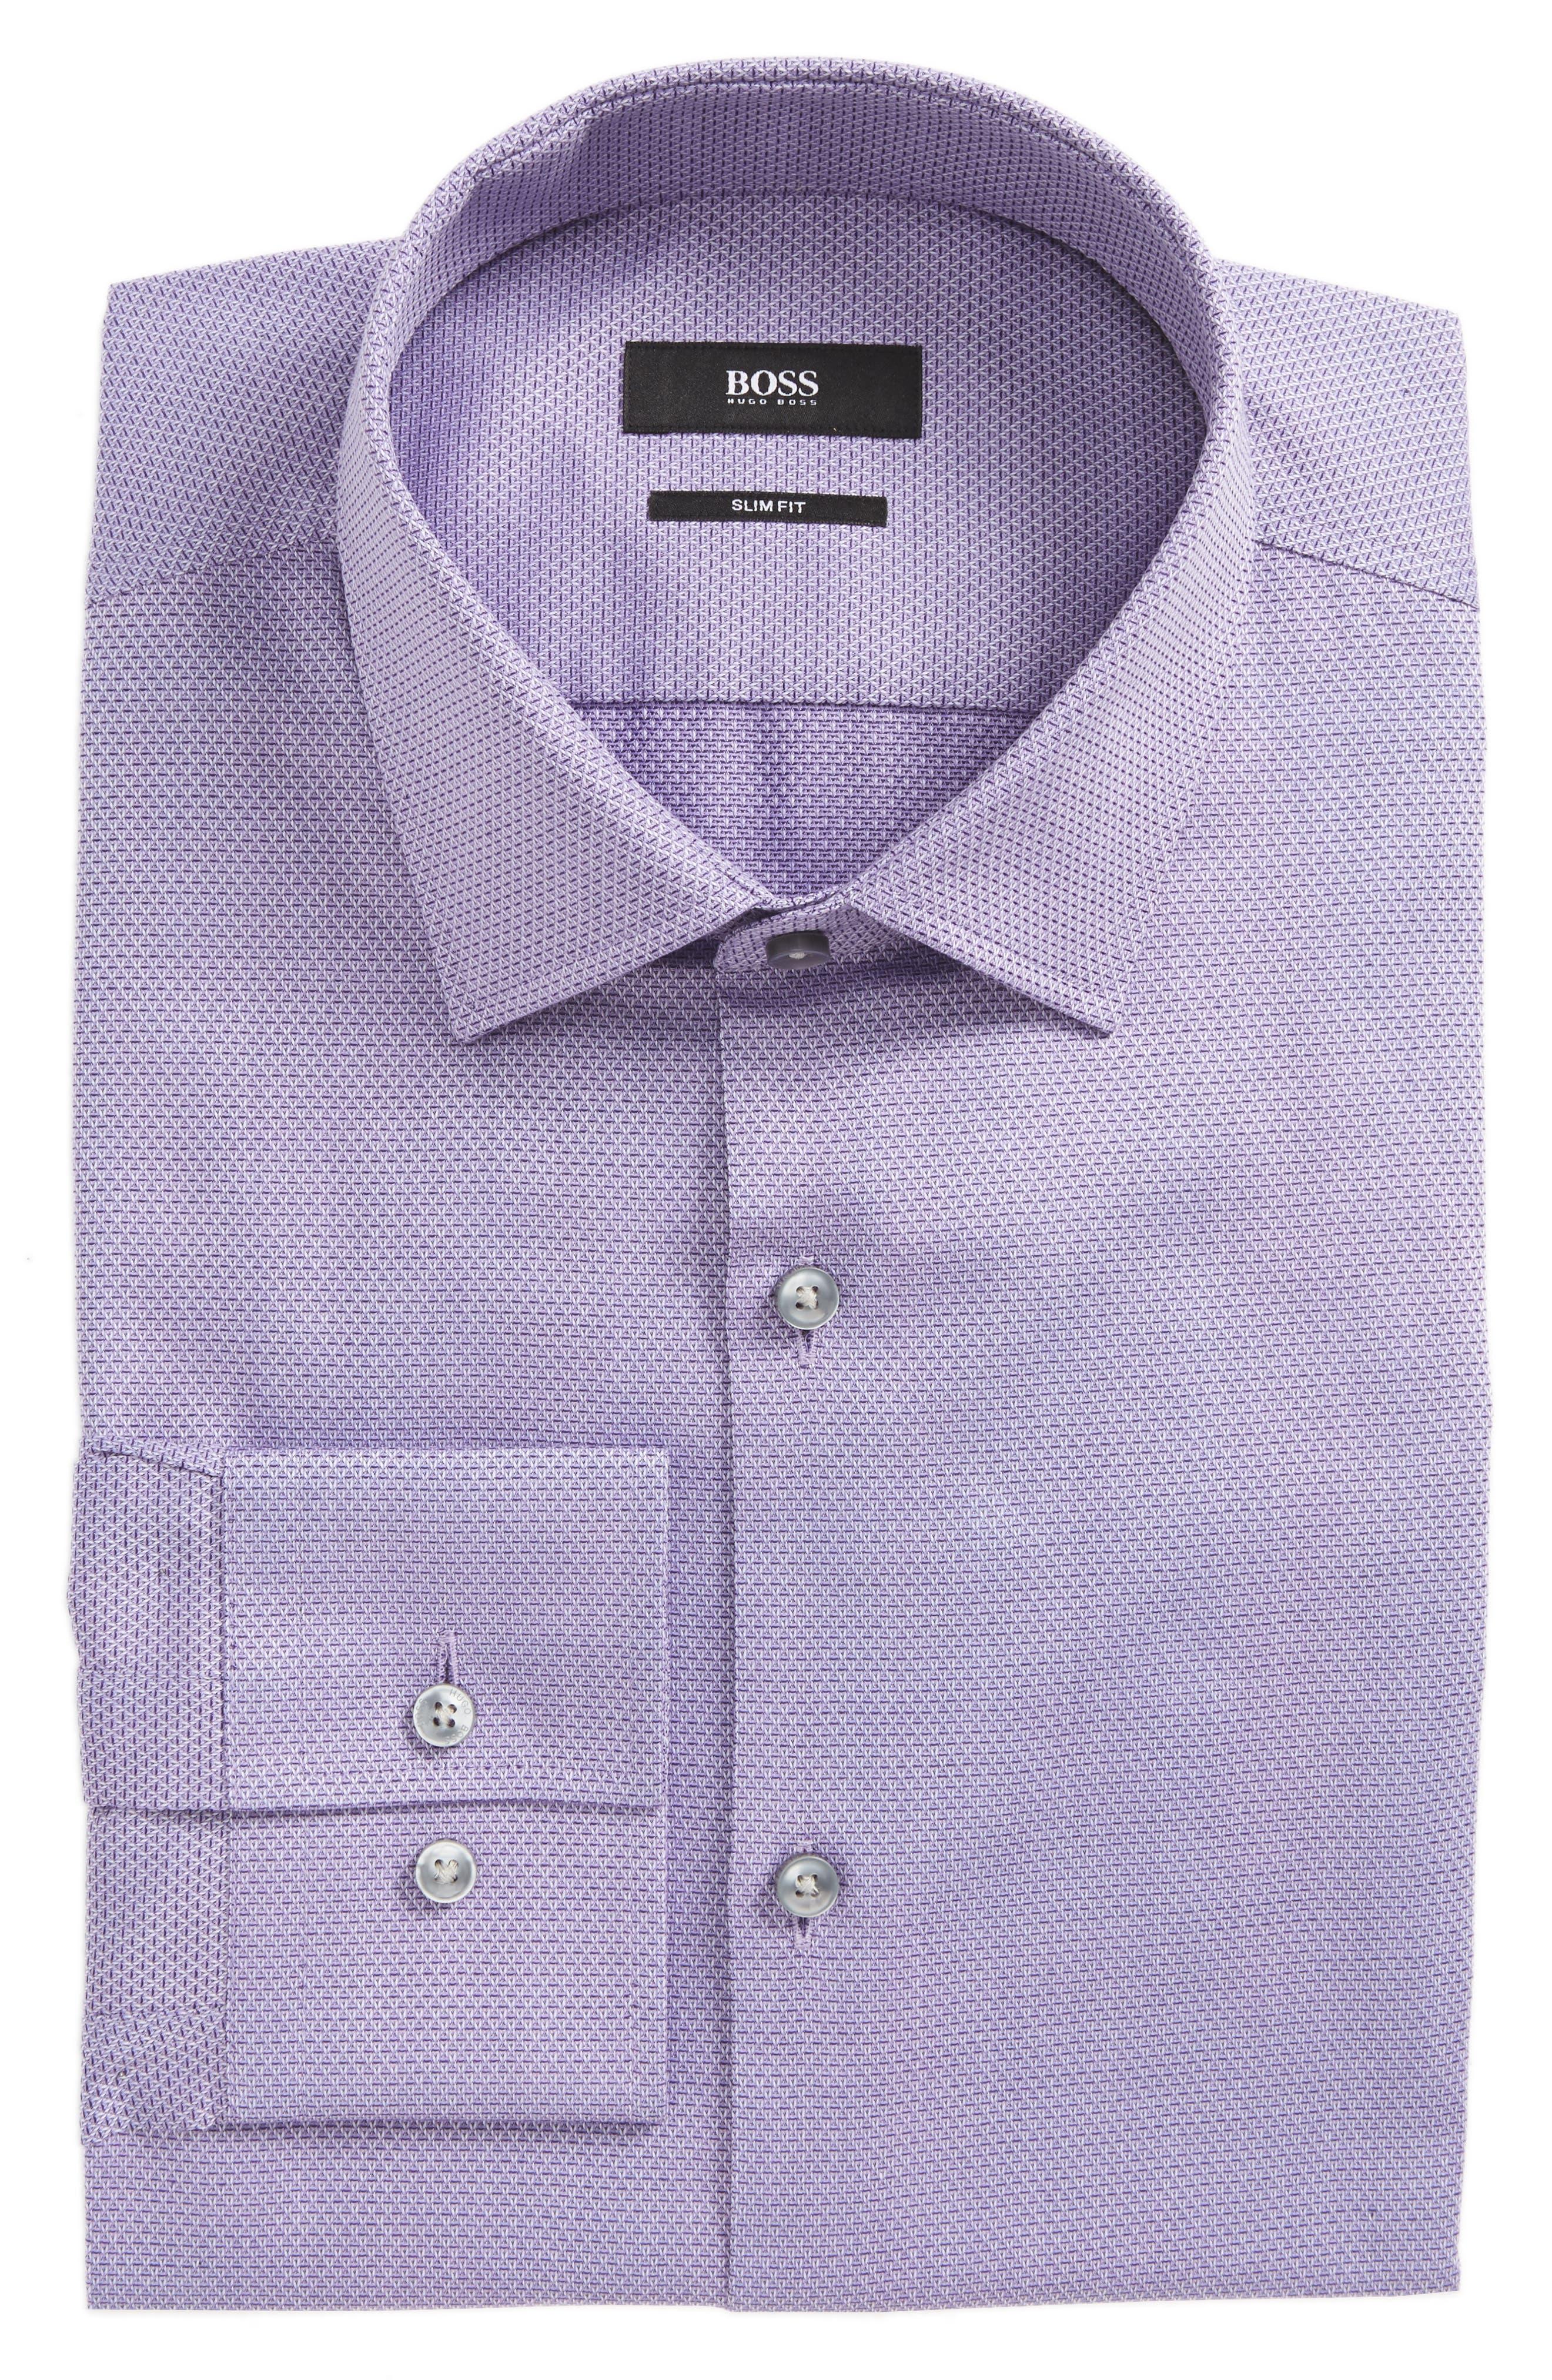 Main Image - BOSS Jenno Slim Fit Textured Dress Shirt